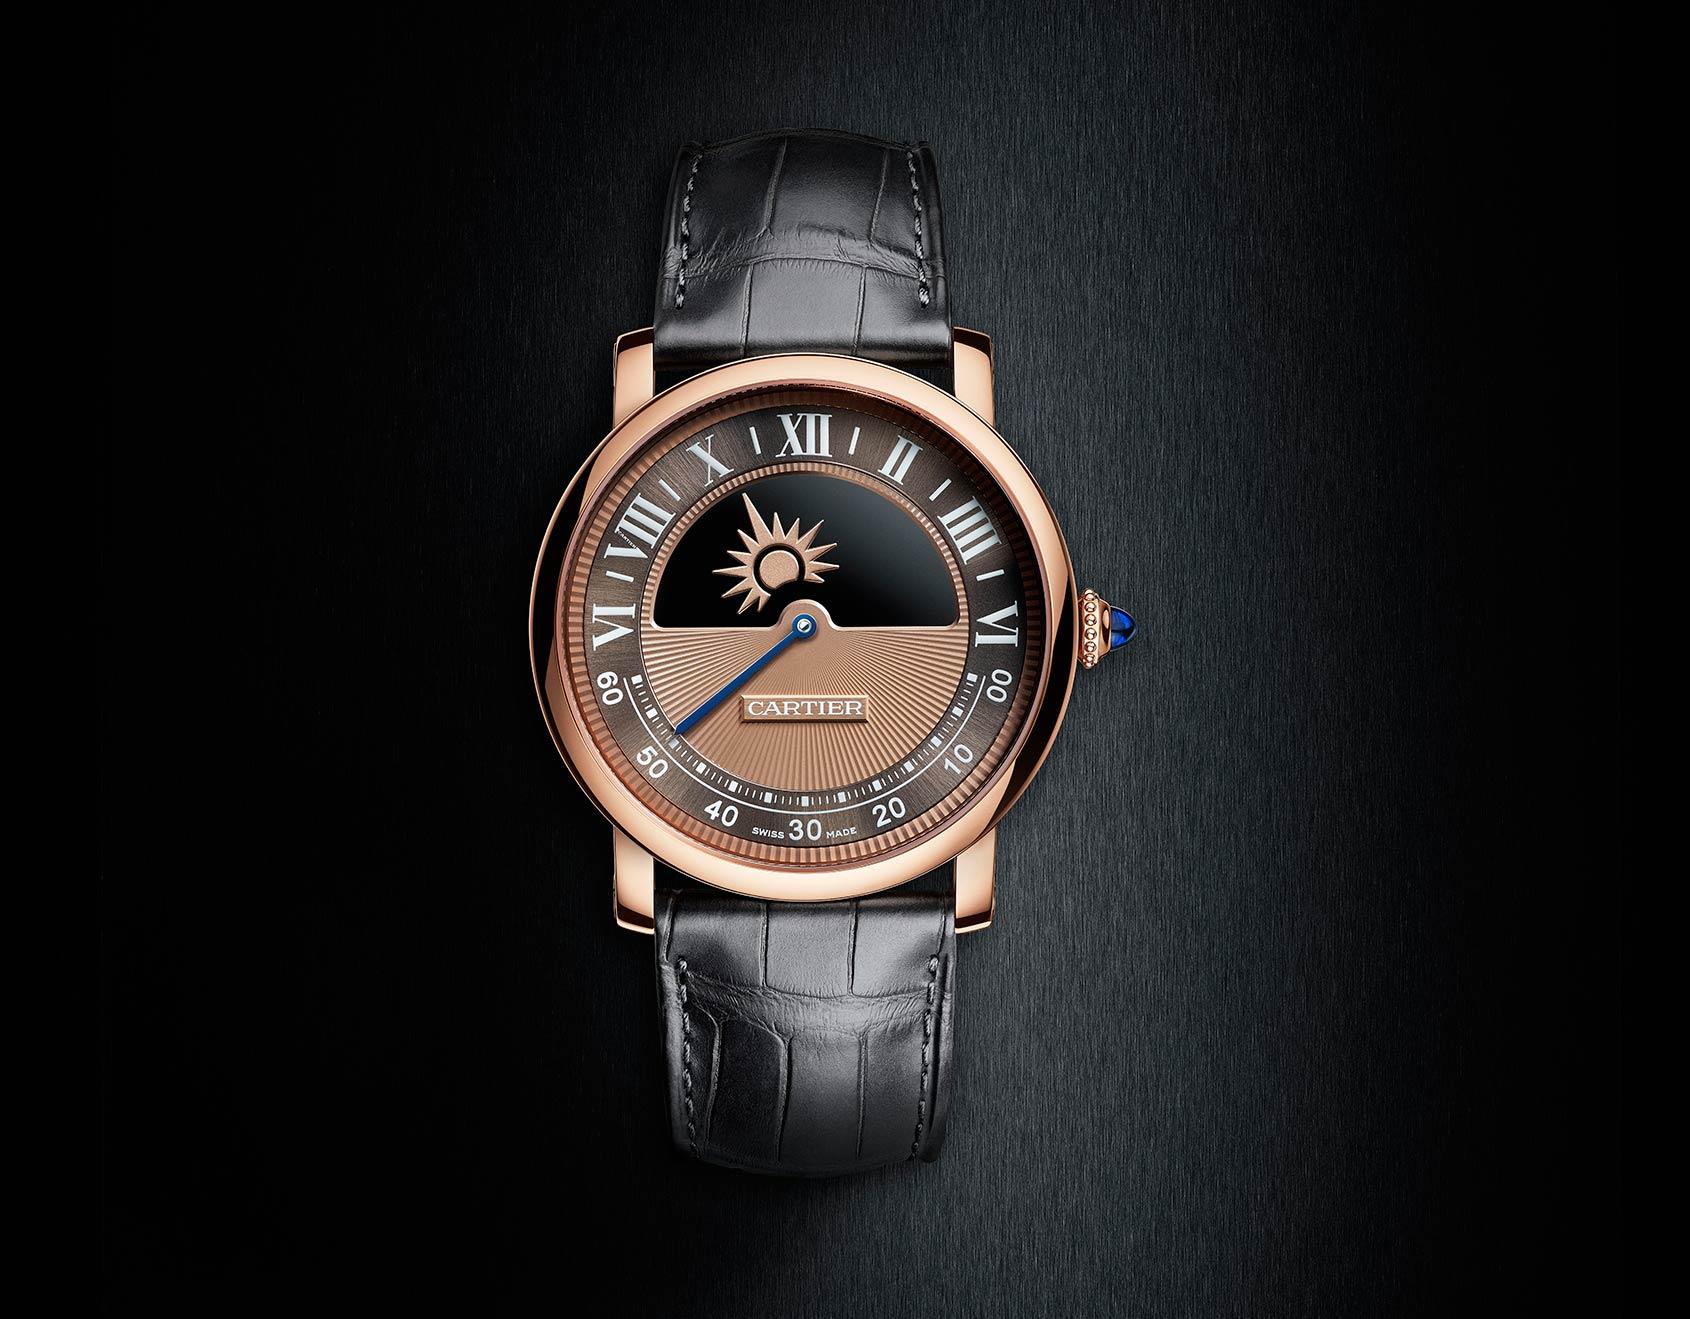 INTRODUCING: The Cartier Rotonde de Cartier Mysterious Day & Night Watch